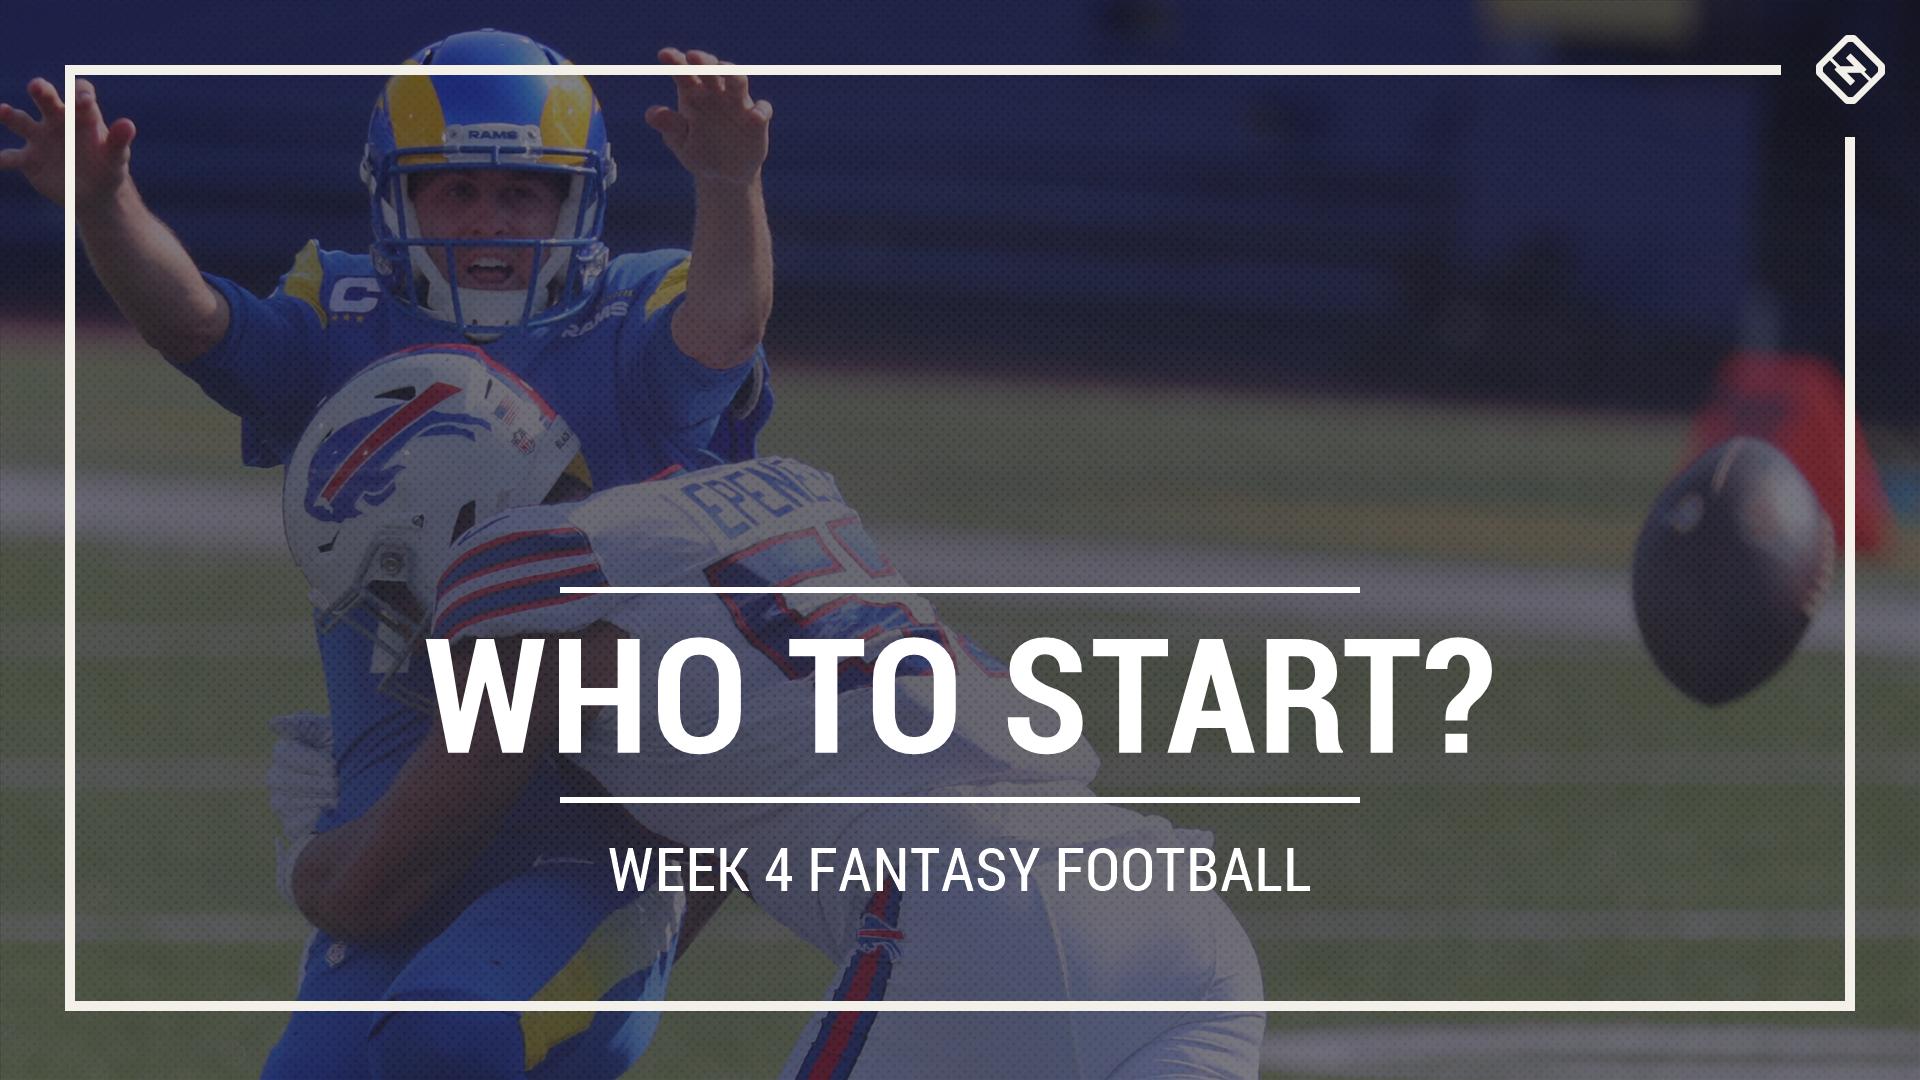 Who to start in fantasy football: Week 4 rankings, start sit advice for PPR, Standard, Superflex scoring